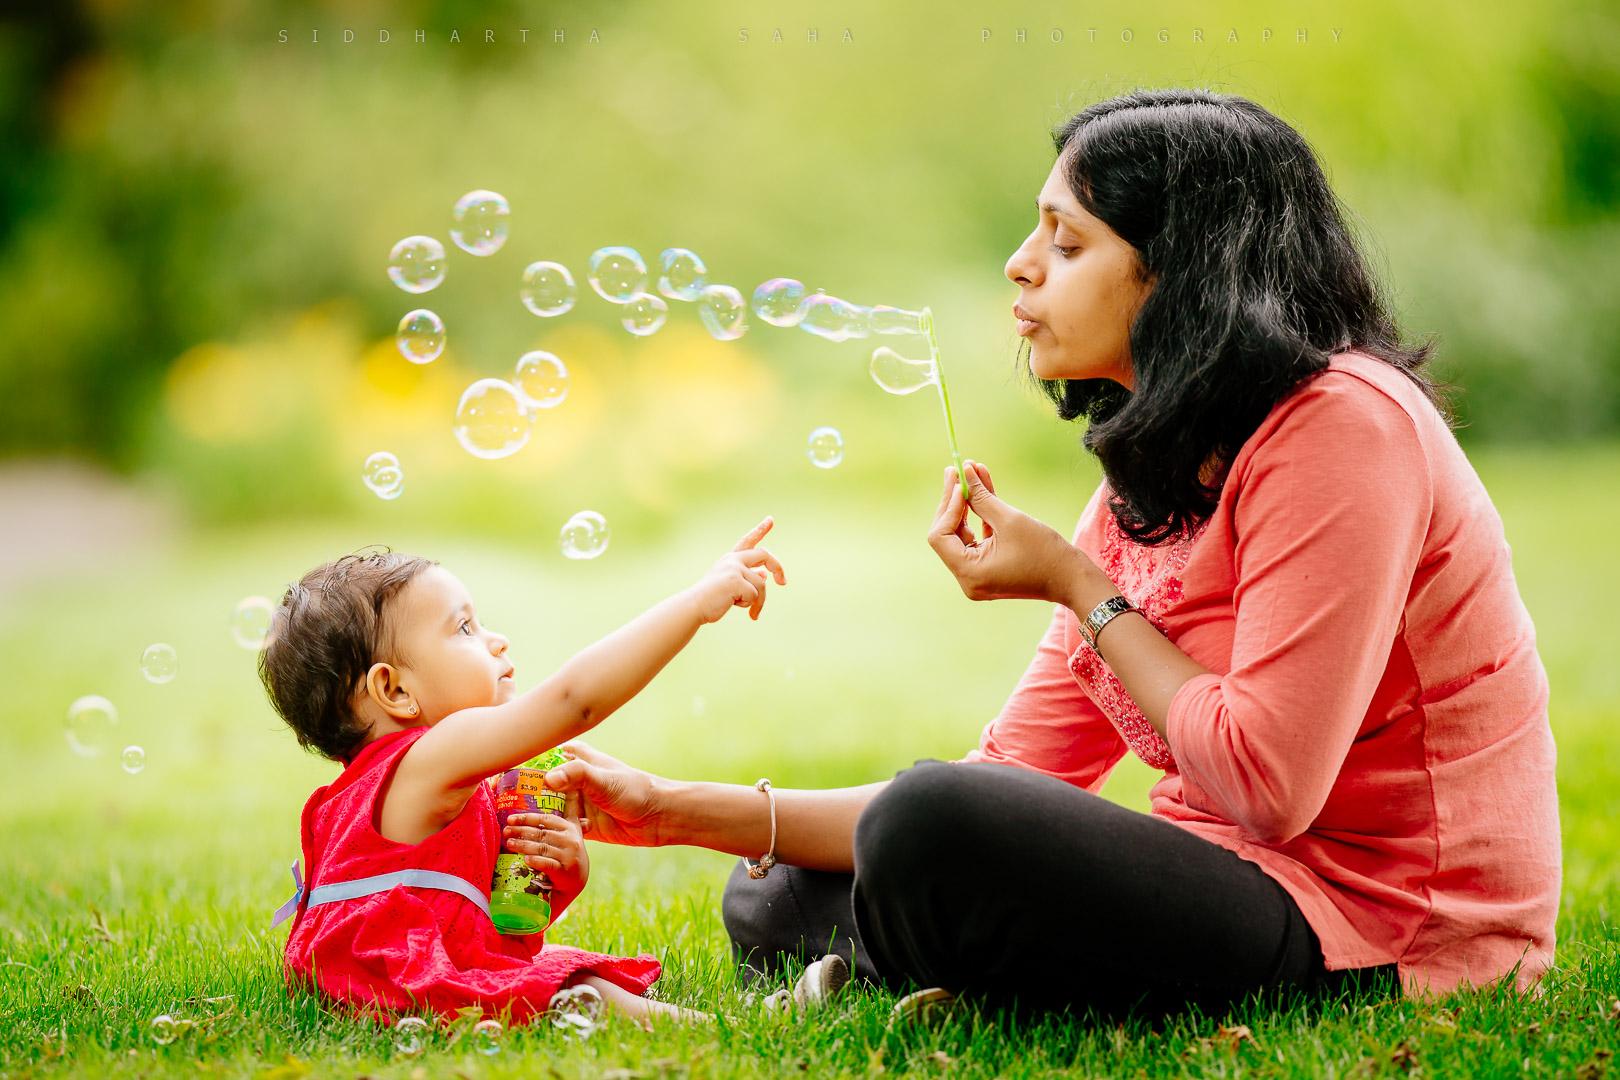 2015-08-08 - Padmaja Ketan Family Photoshoot - _05Y8874-01